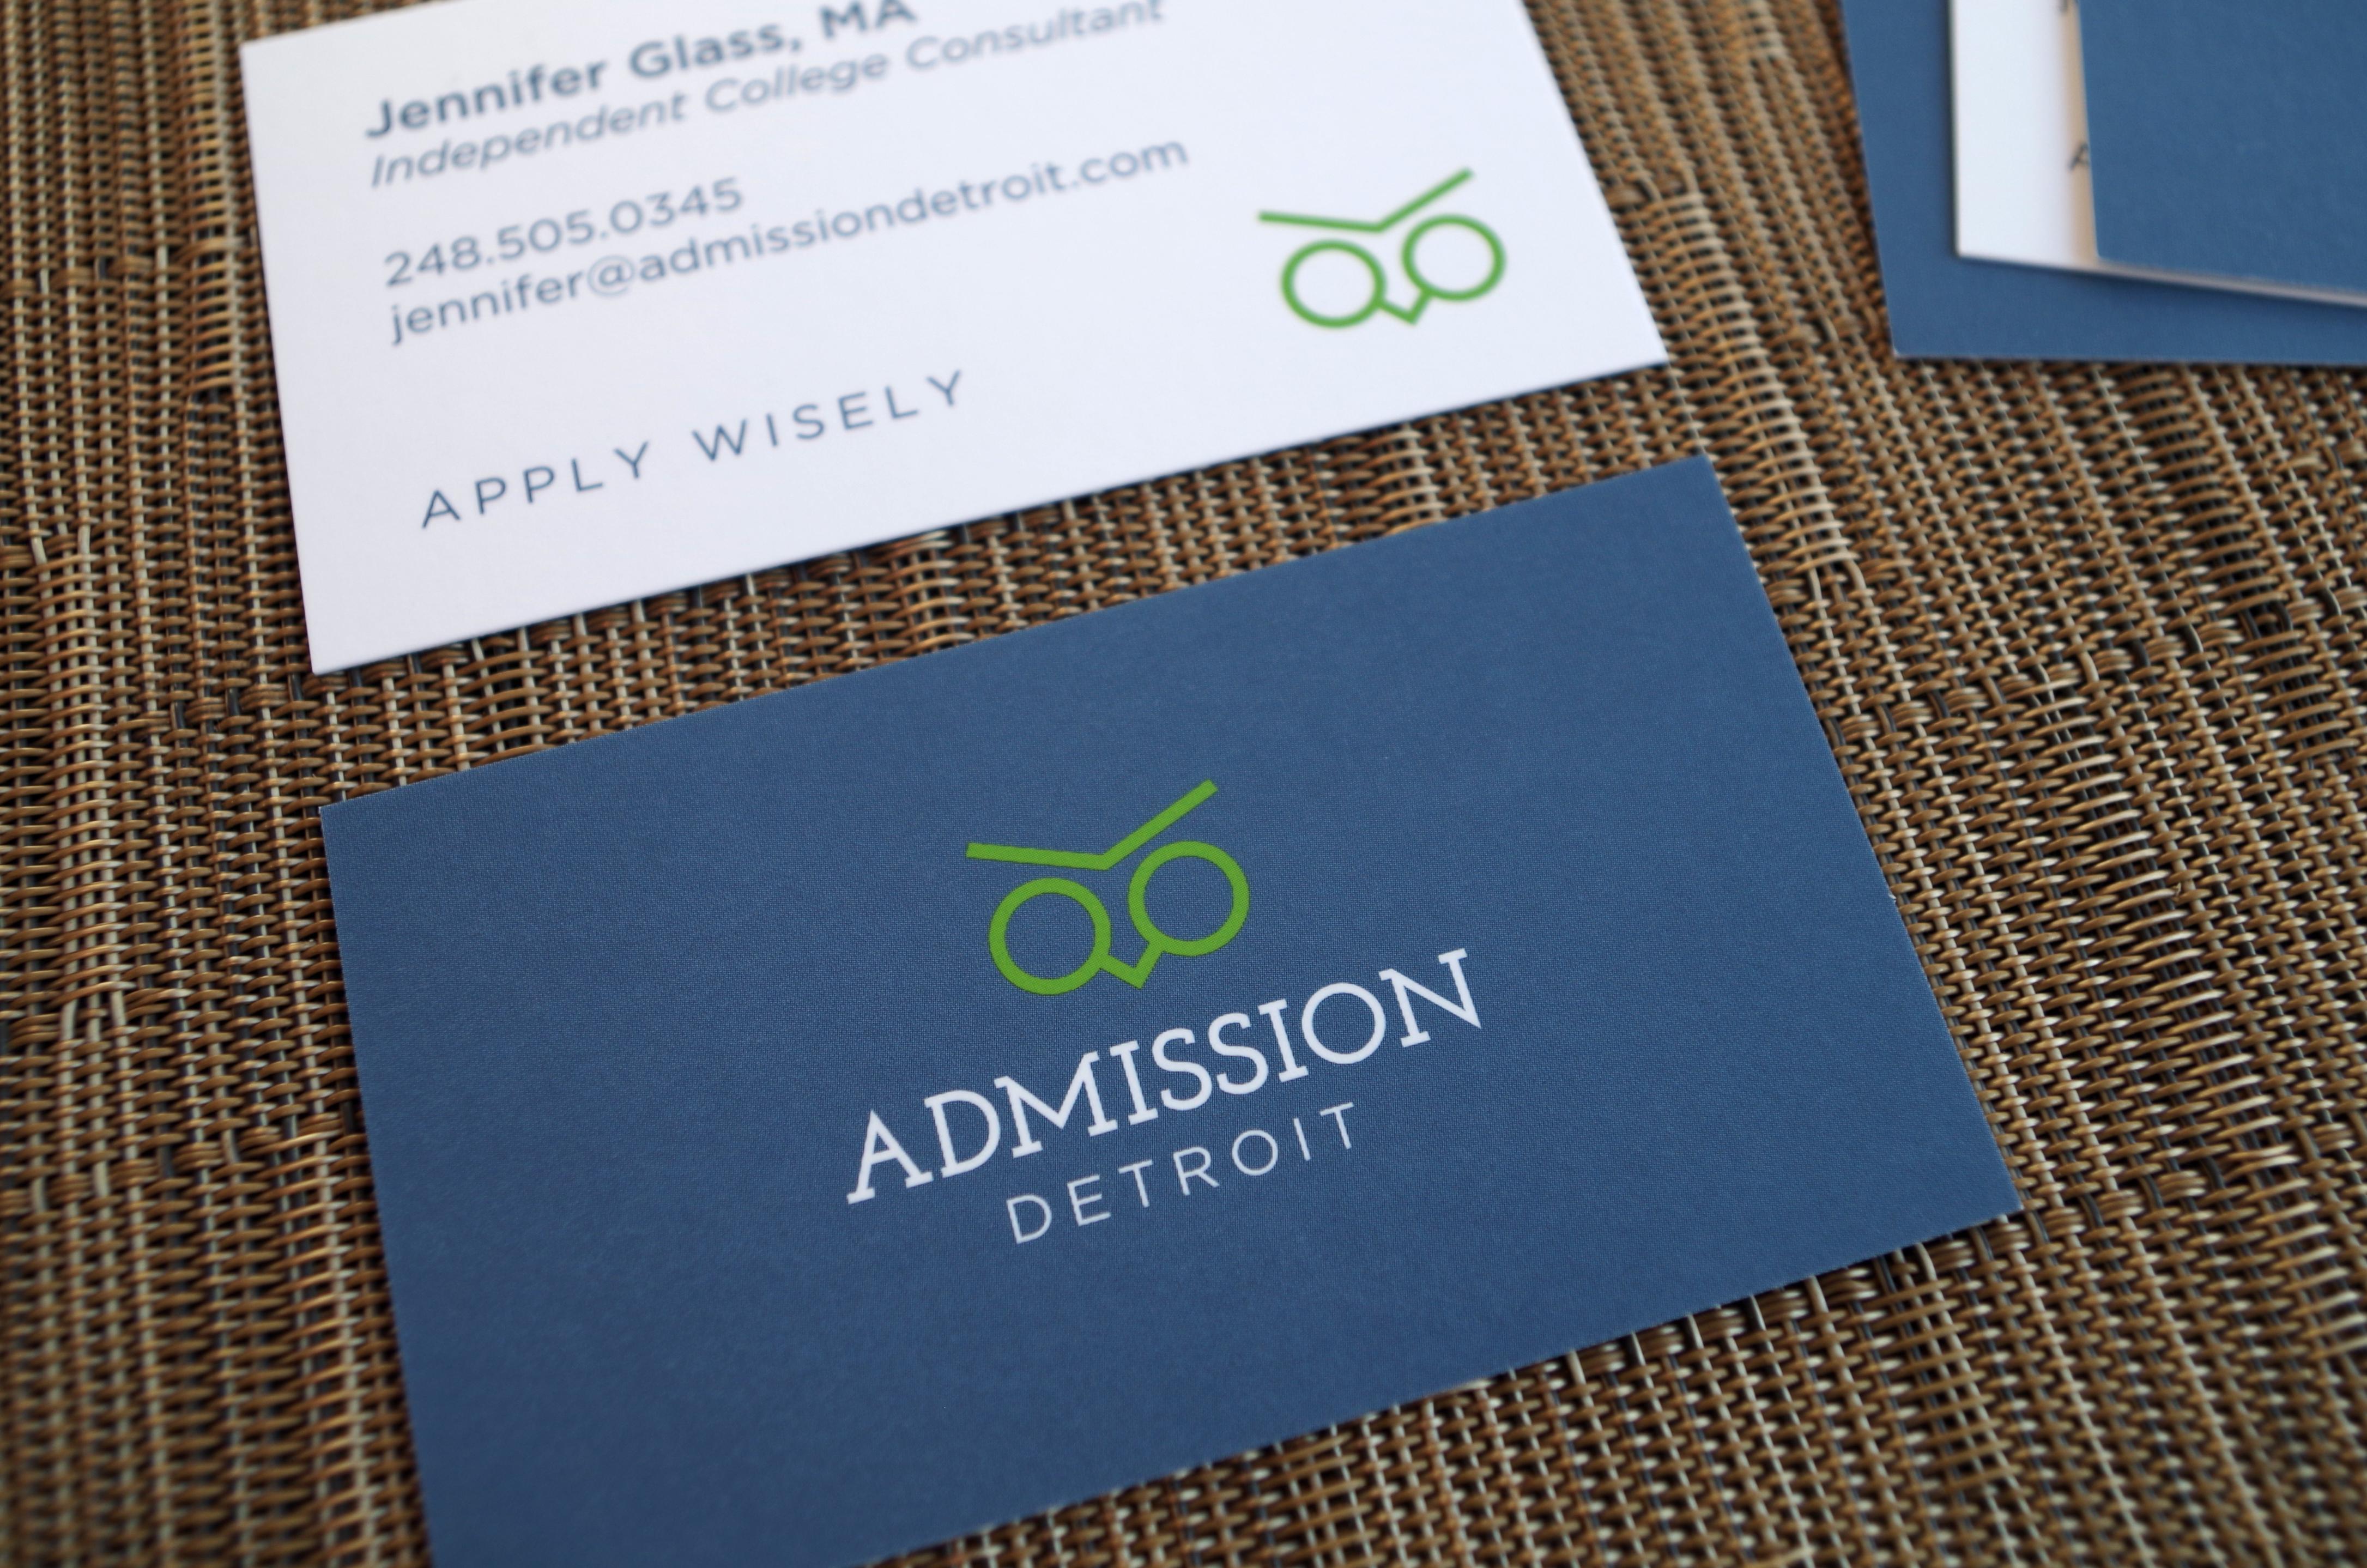 Admission Detroit Business Card